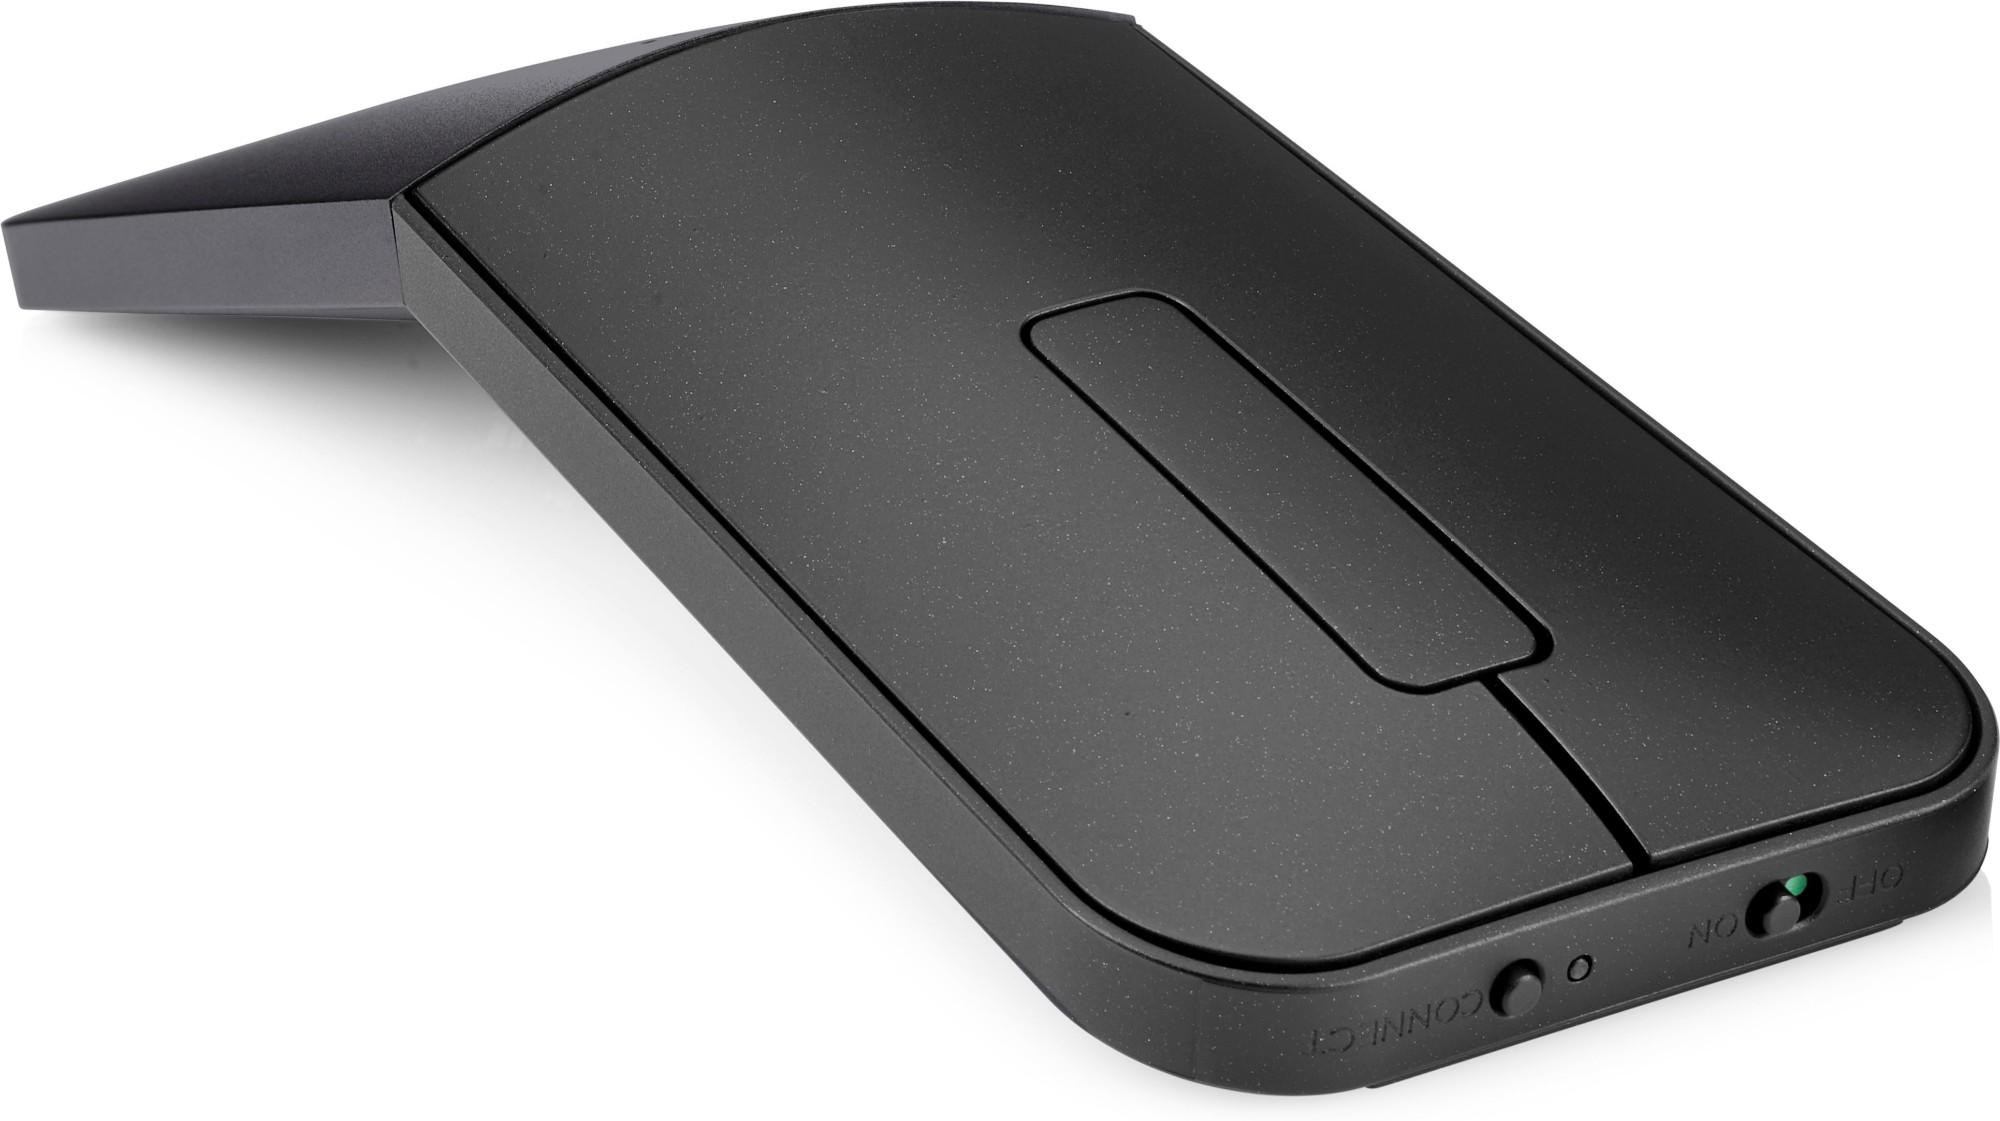 HP Elite Presenter mouse Bluetooth Optical 1200 DPI Ambidextrous